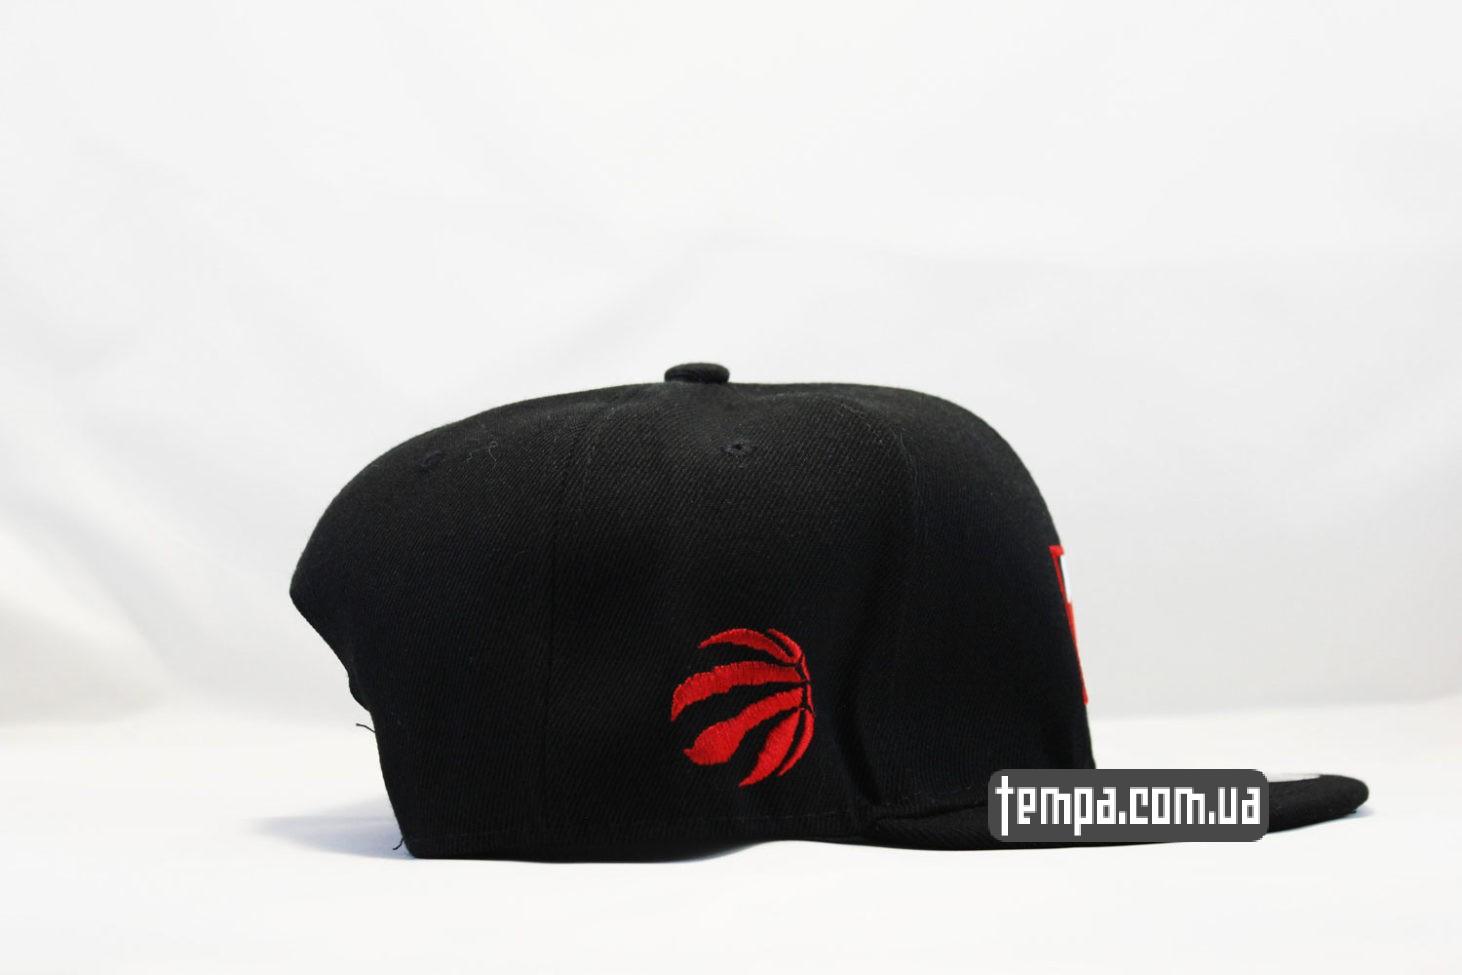 NBA AND1 баскетбольная Кепка Snapback Canada New Era с канадским флагом